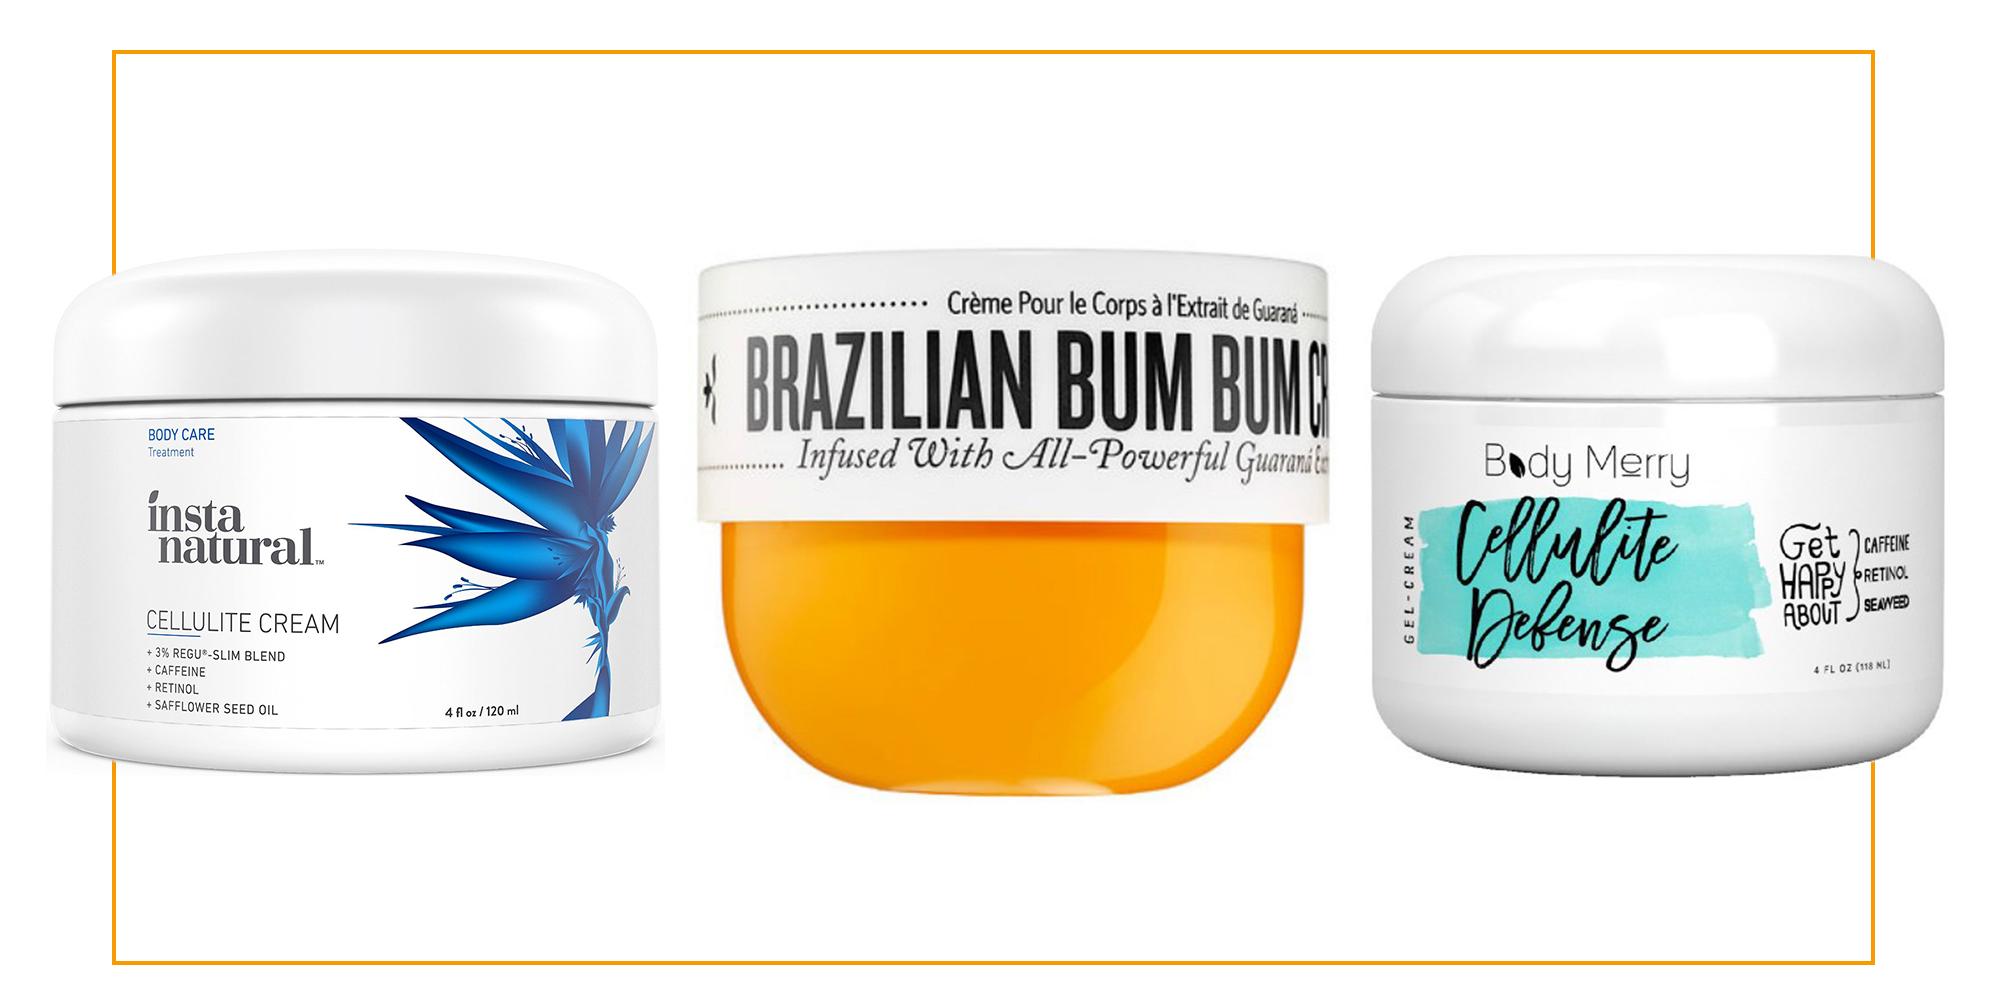 Car Bedroom Decor 9 Best Cellulite Creams In 2017 Skin Tightening Cream